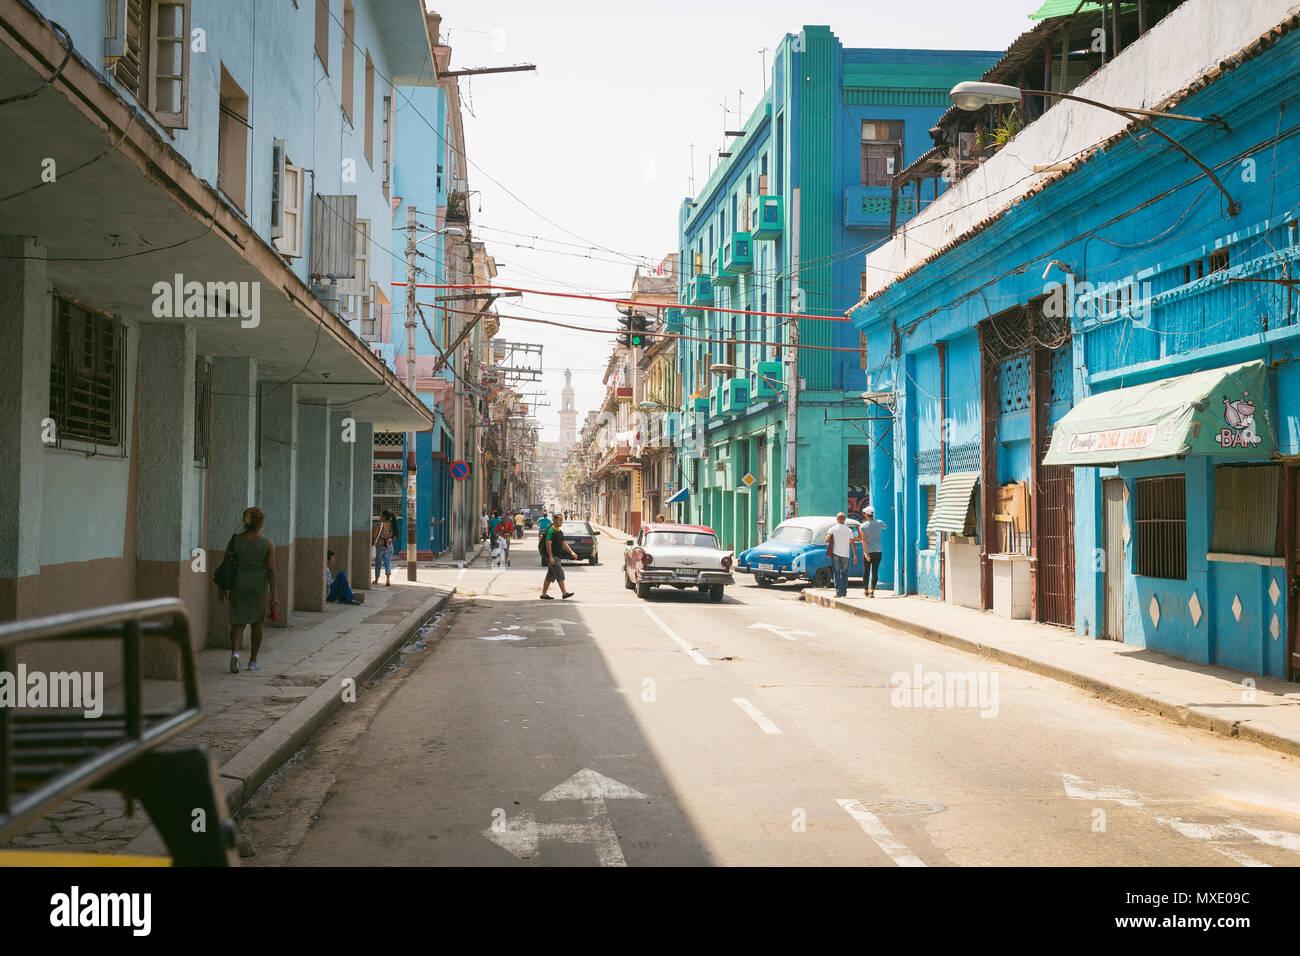 Strolling streets of Havana, Cuba - Stock Image